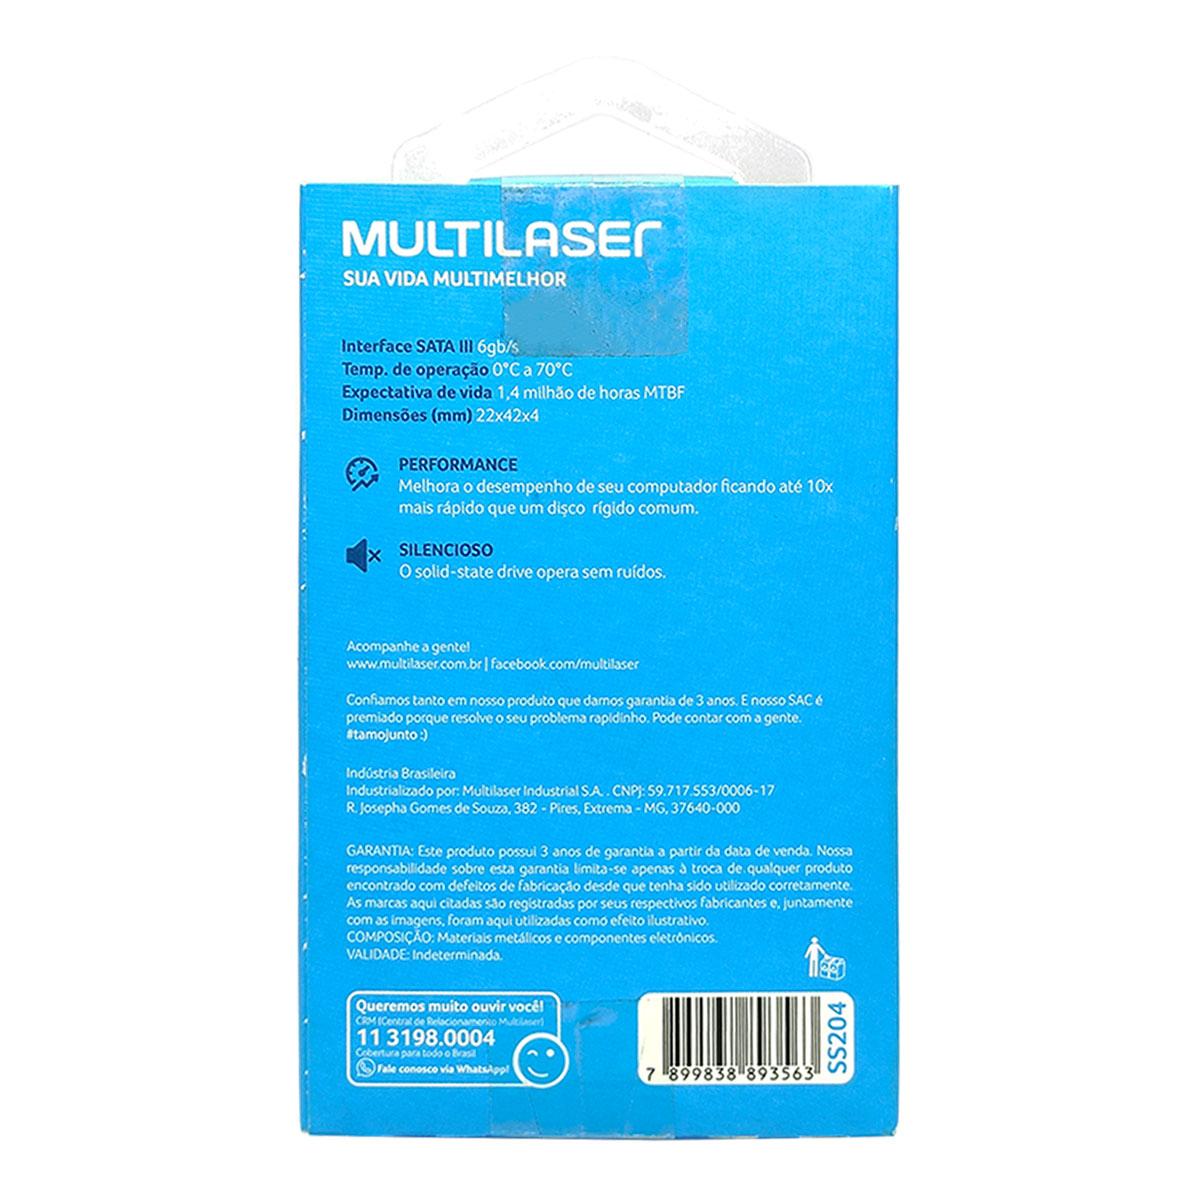 HD SSD 240GB Multilaser Axis 500 SS204, Leitura 500MB/s, Gravação 450MB/s, M.2 2242, SATA III 6 GB/s